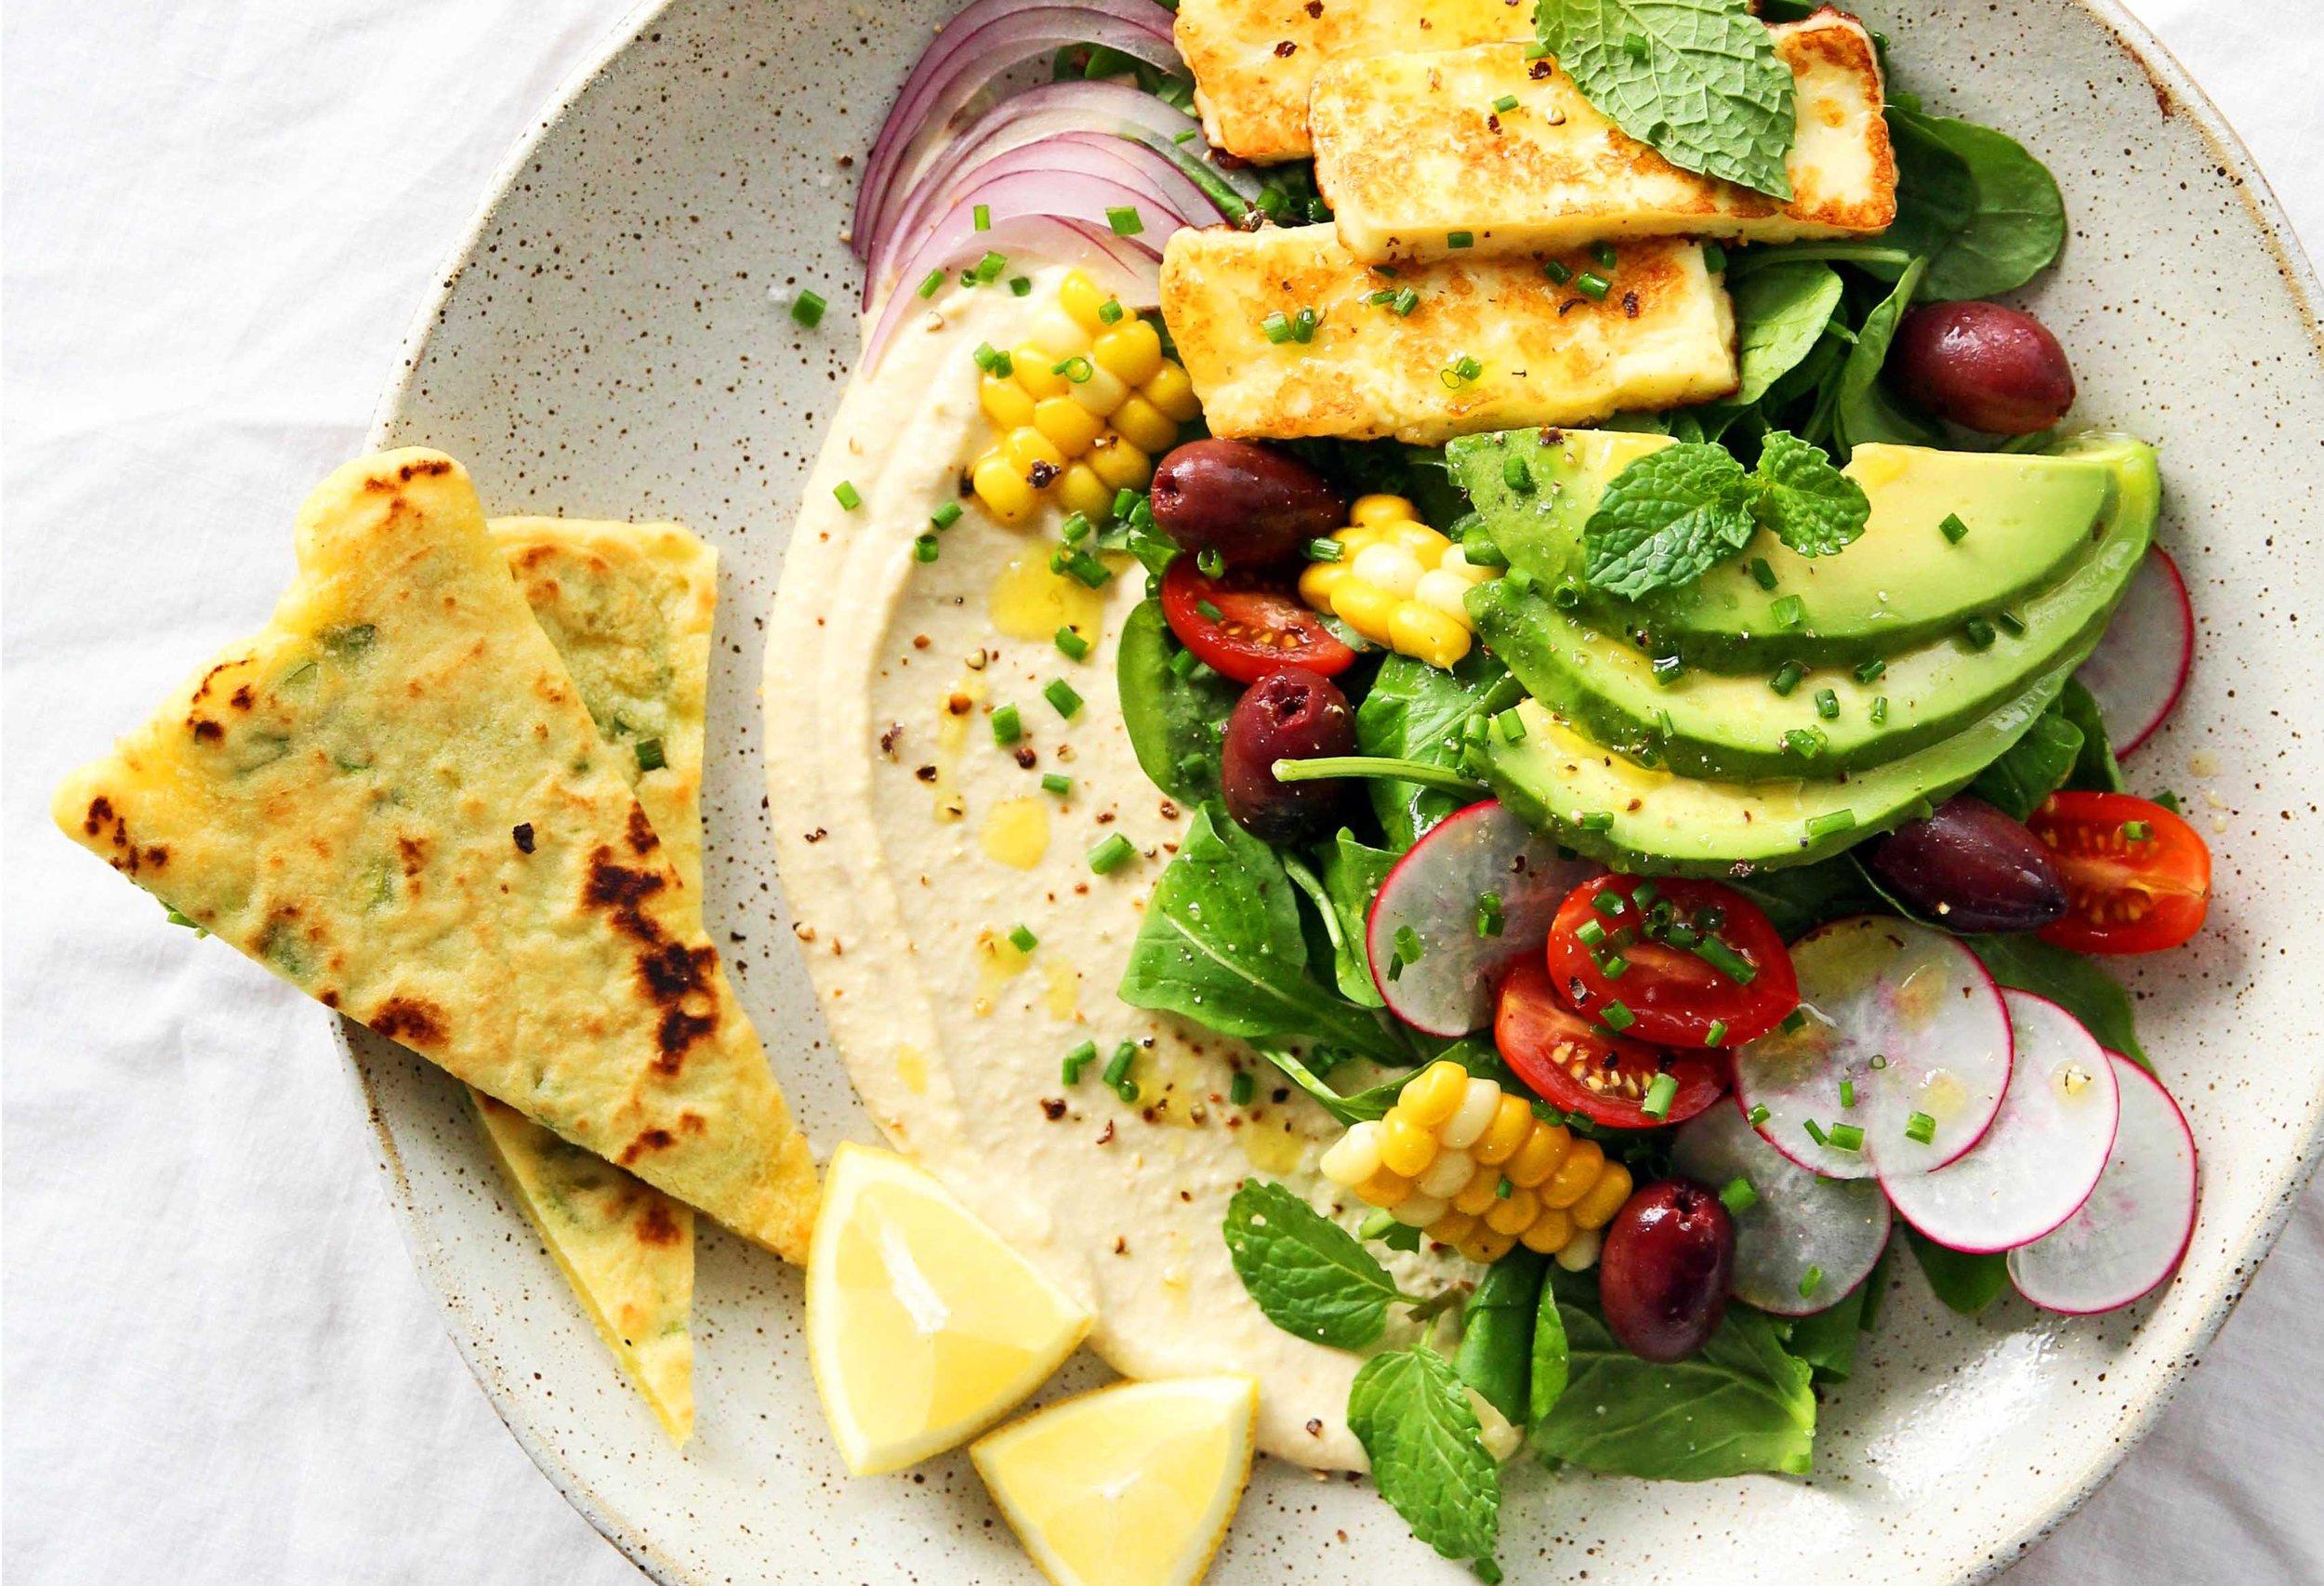 BLOG_Hummus salad 2.jpg